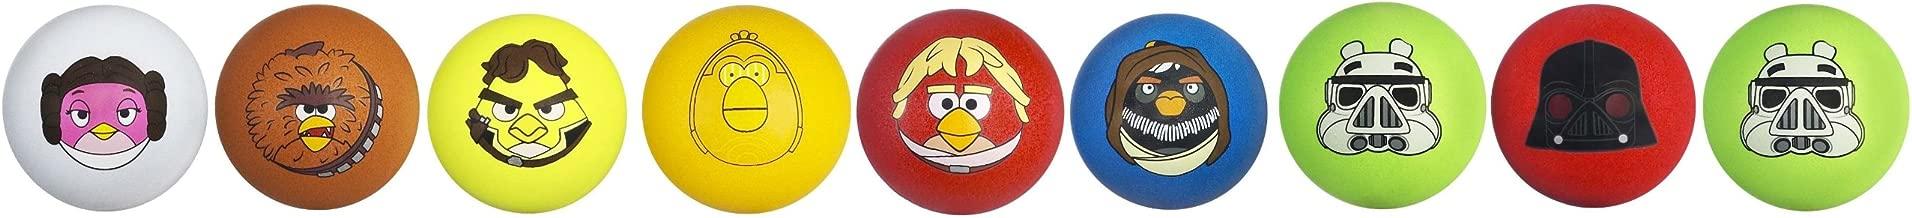 Star Wars Angry Birds Koosh Set of 9 Star Wars Character Balls